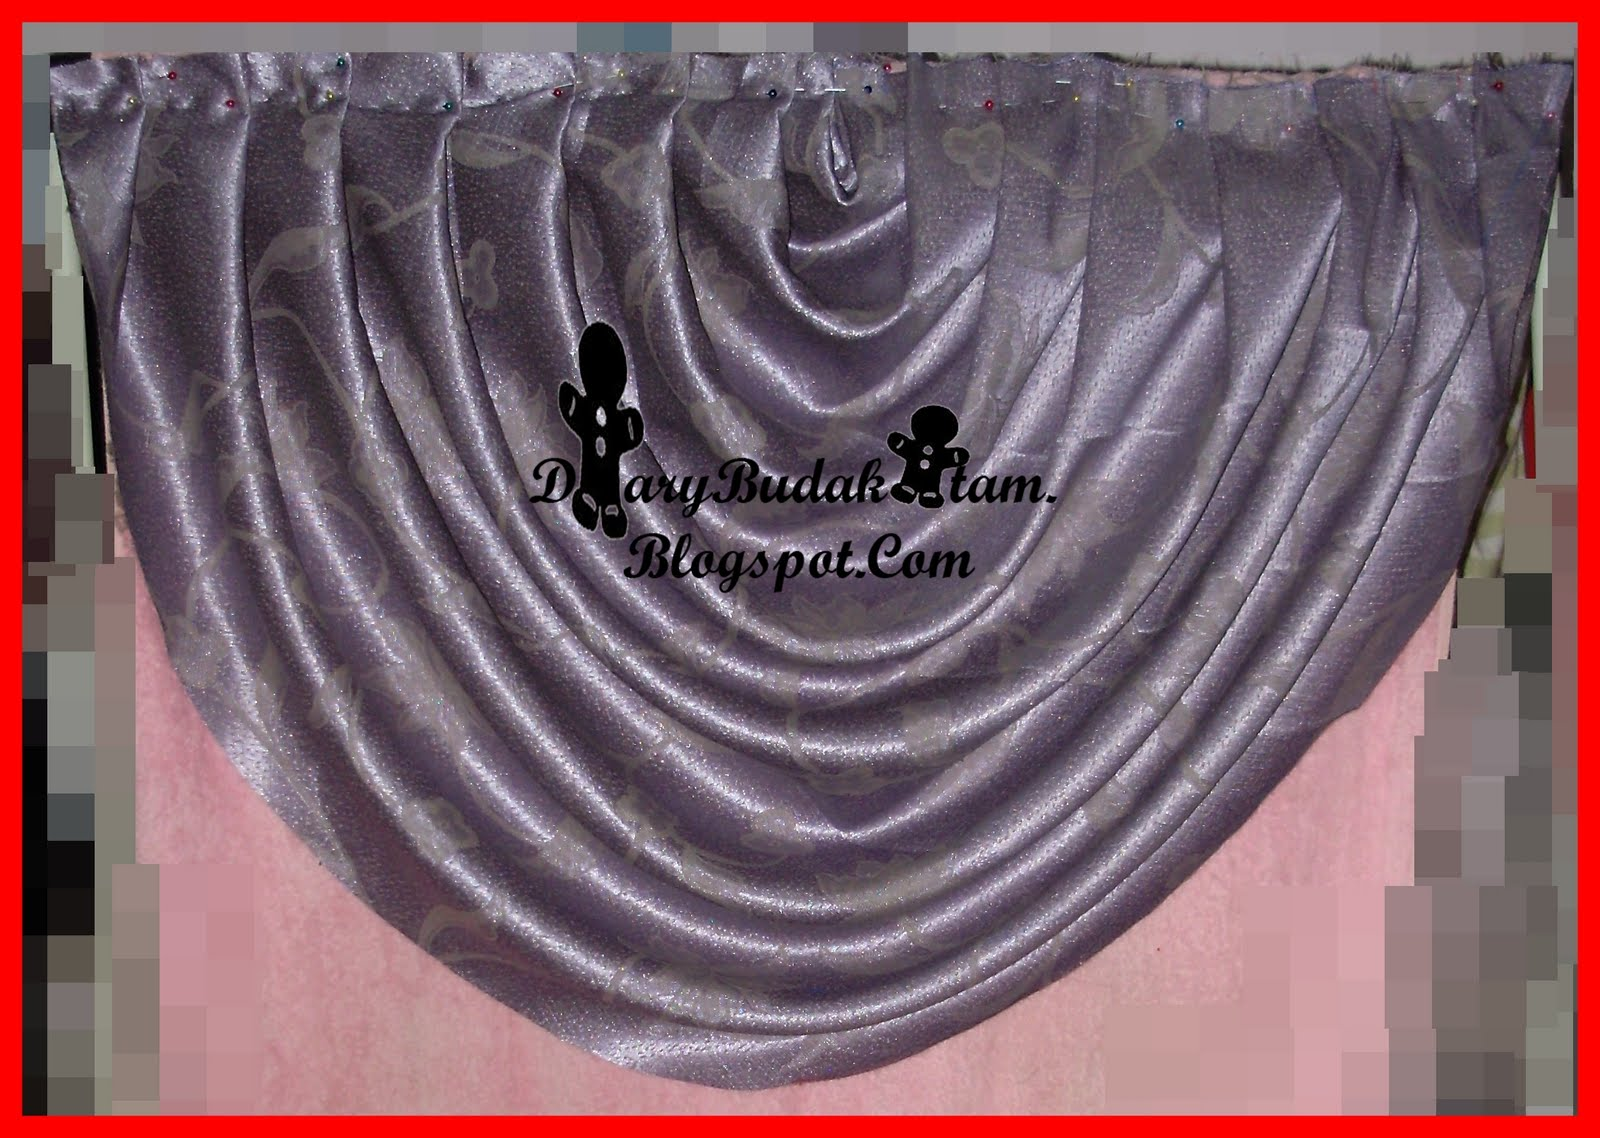 LANGSIR SCALLOP VERSI 1 (swags curtain)